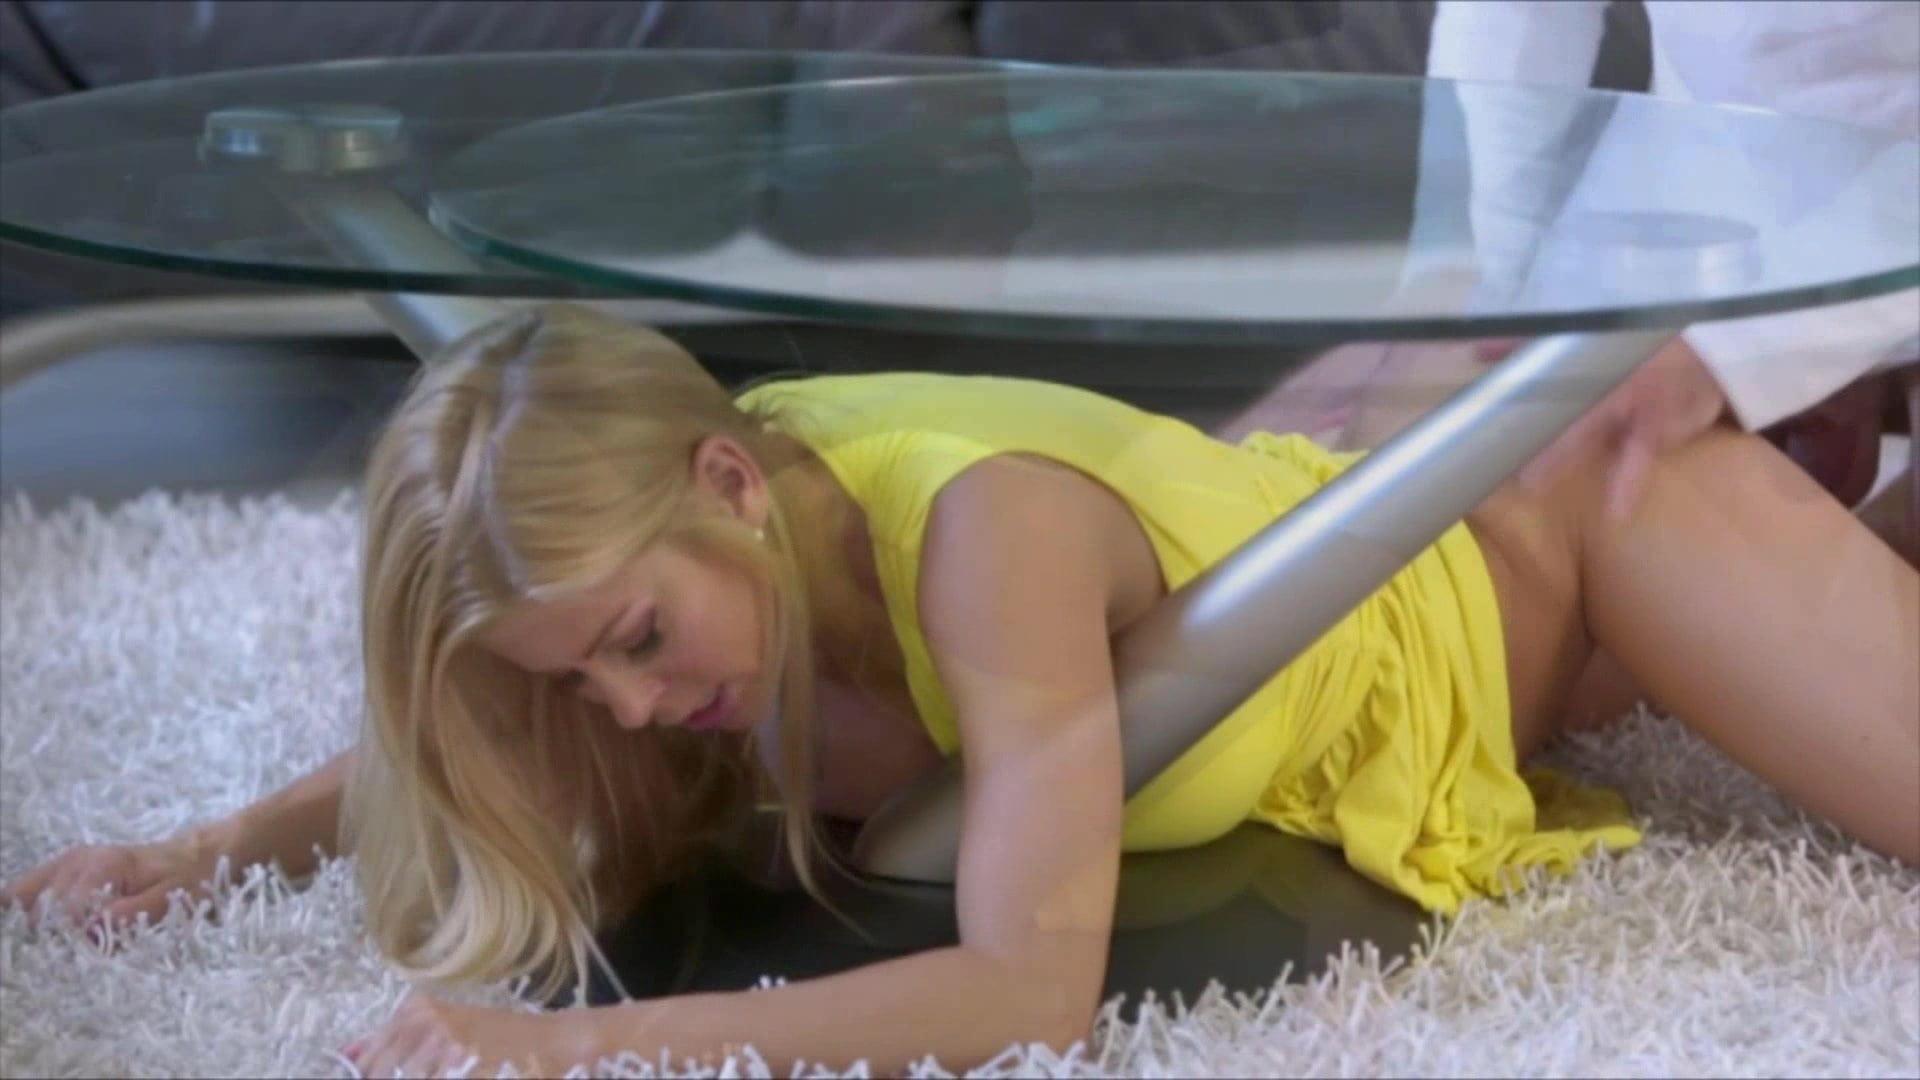 Alexis fawx stuck under table